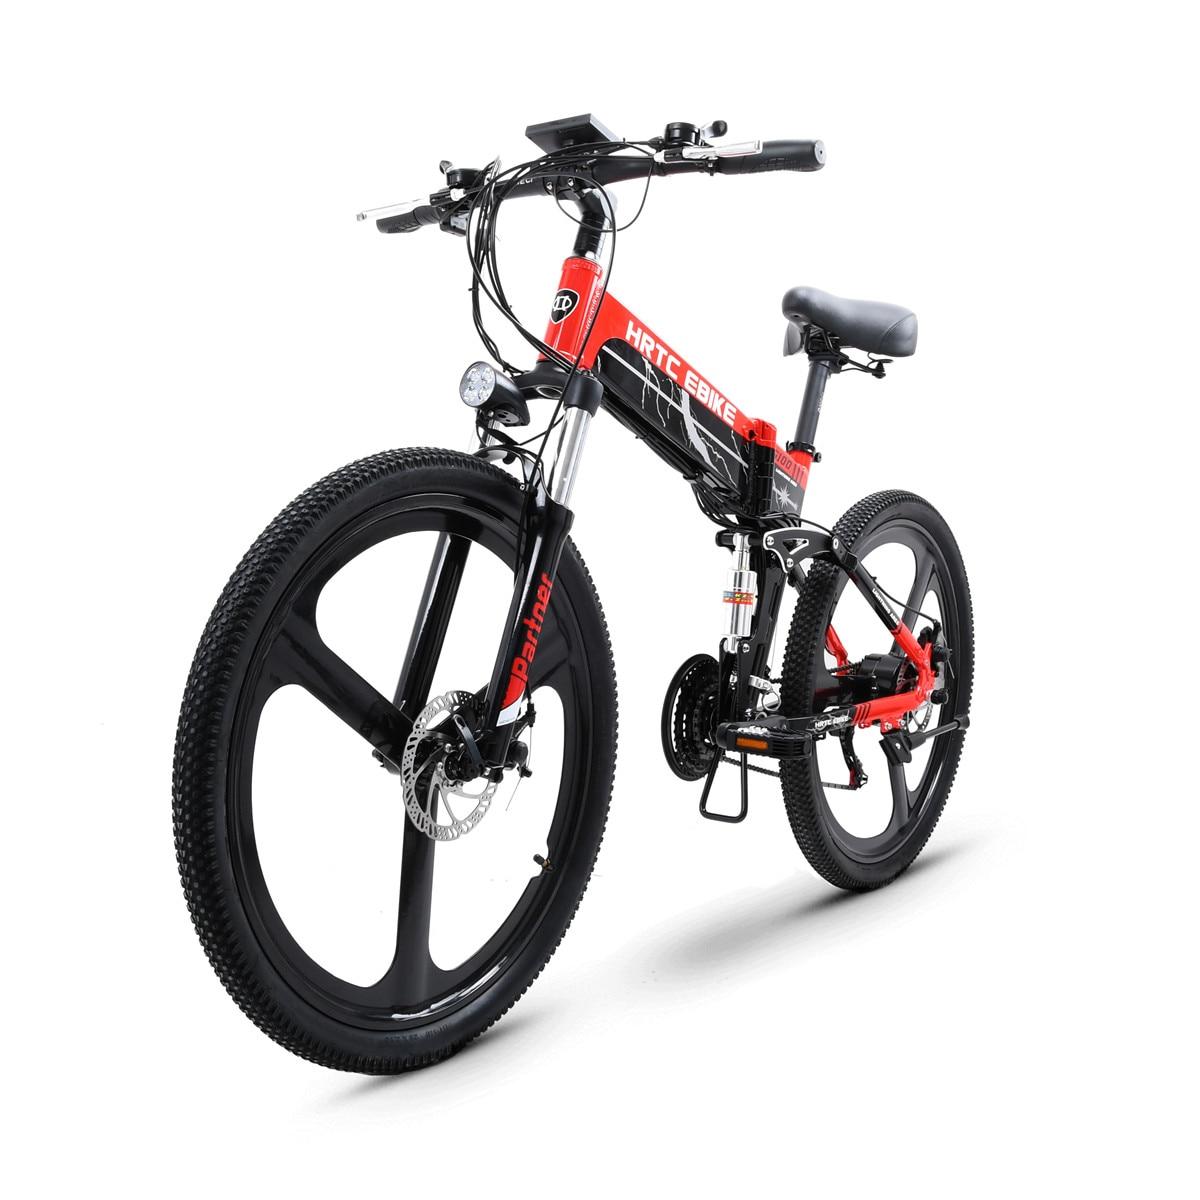 New 26inch electric mountain bike 48V hidden lithium battery 500w rear wheel motor fold emtb Soft tail suspension electric bike